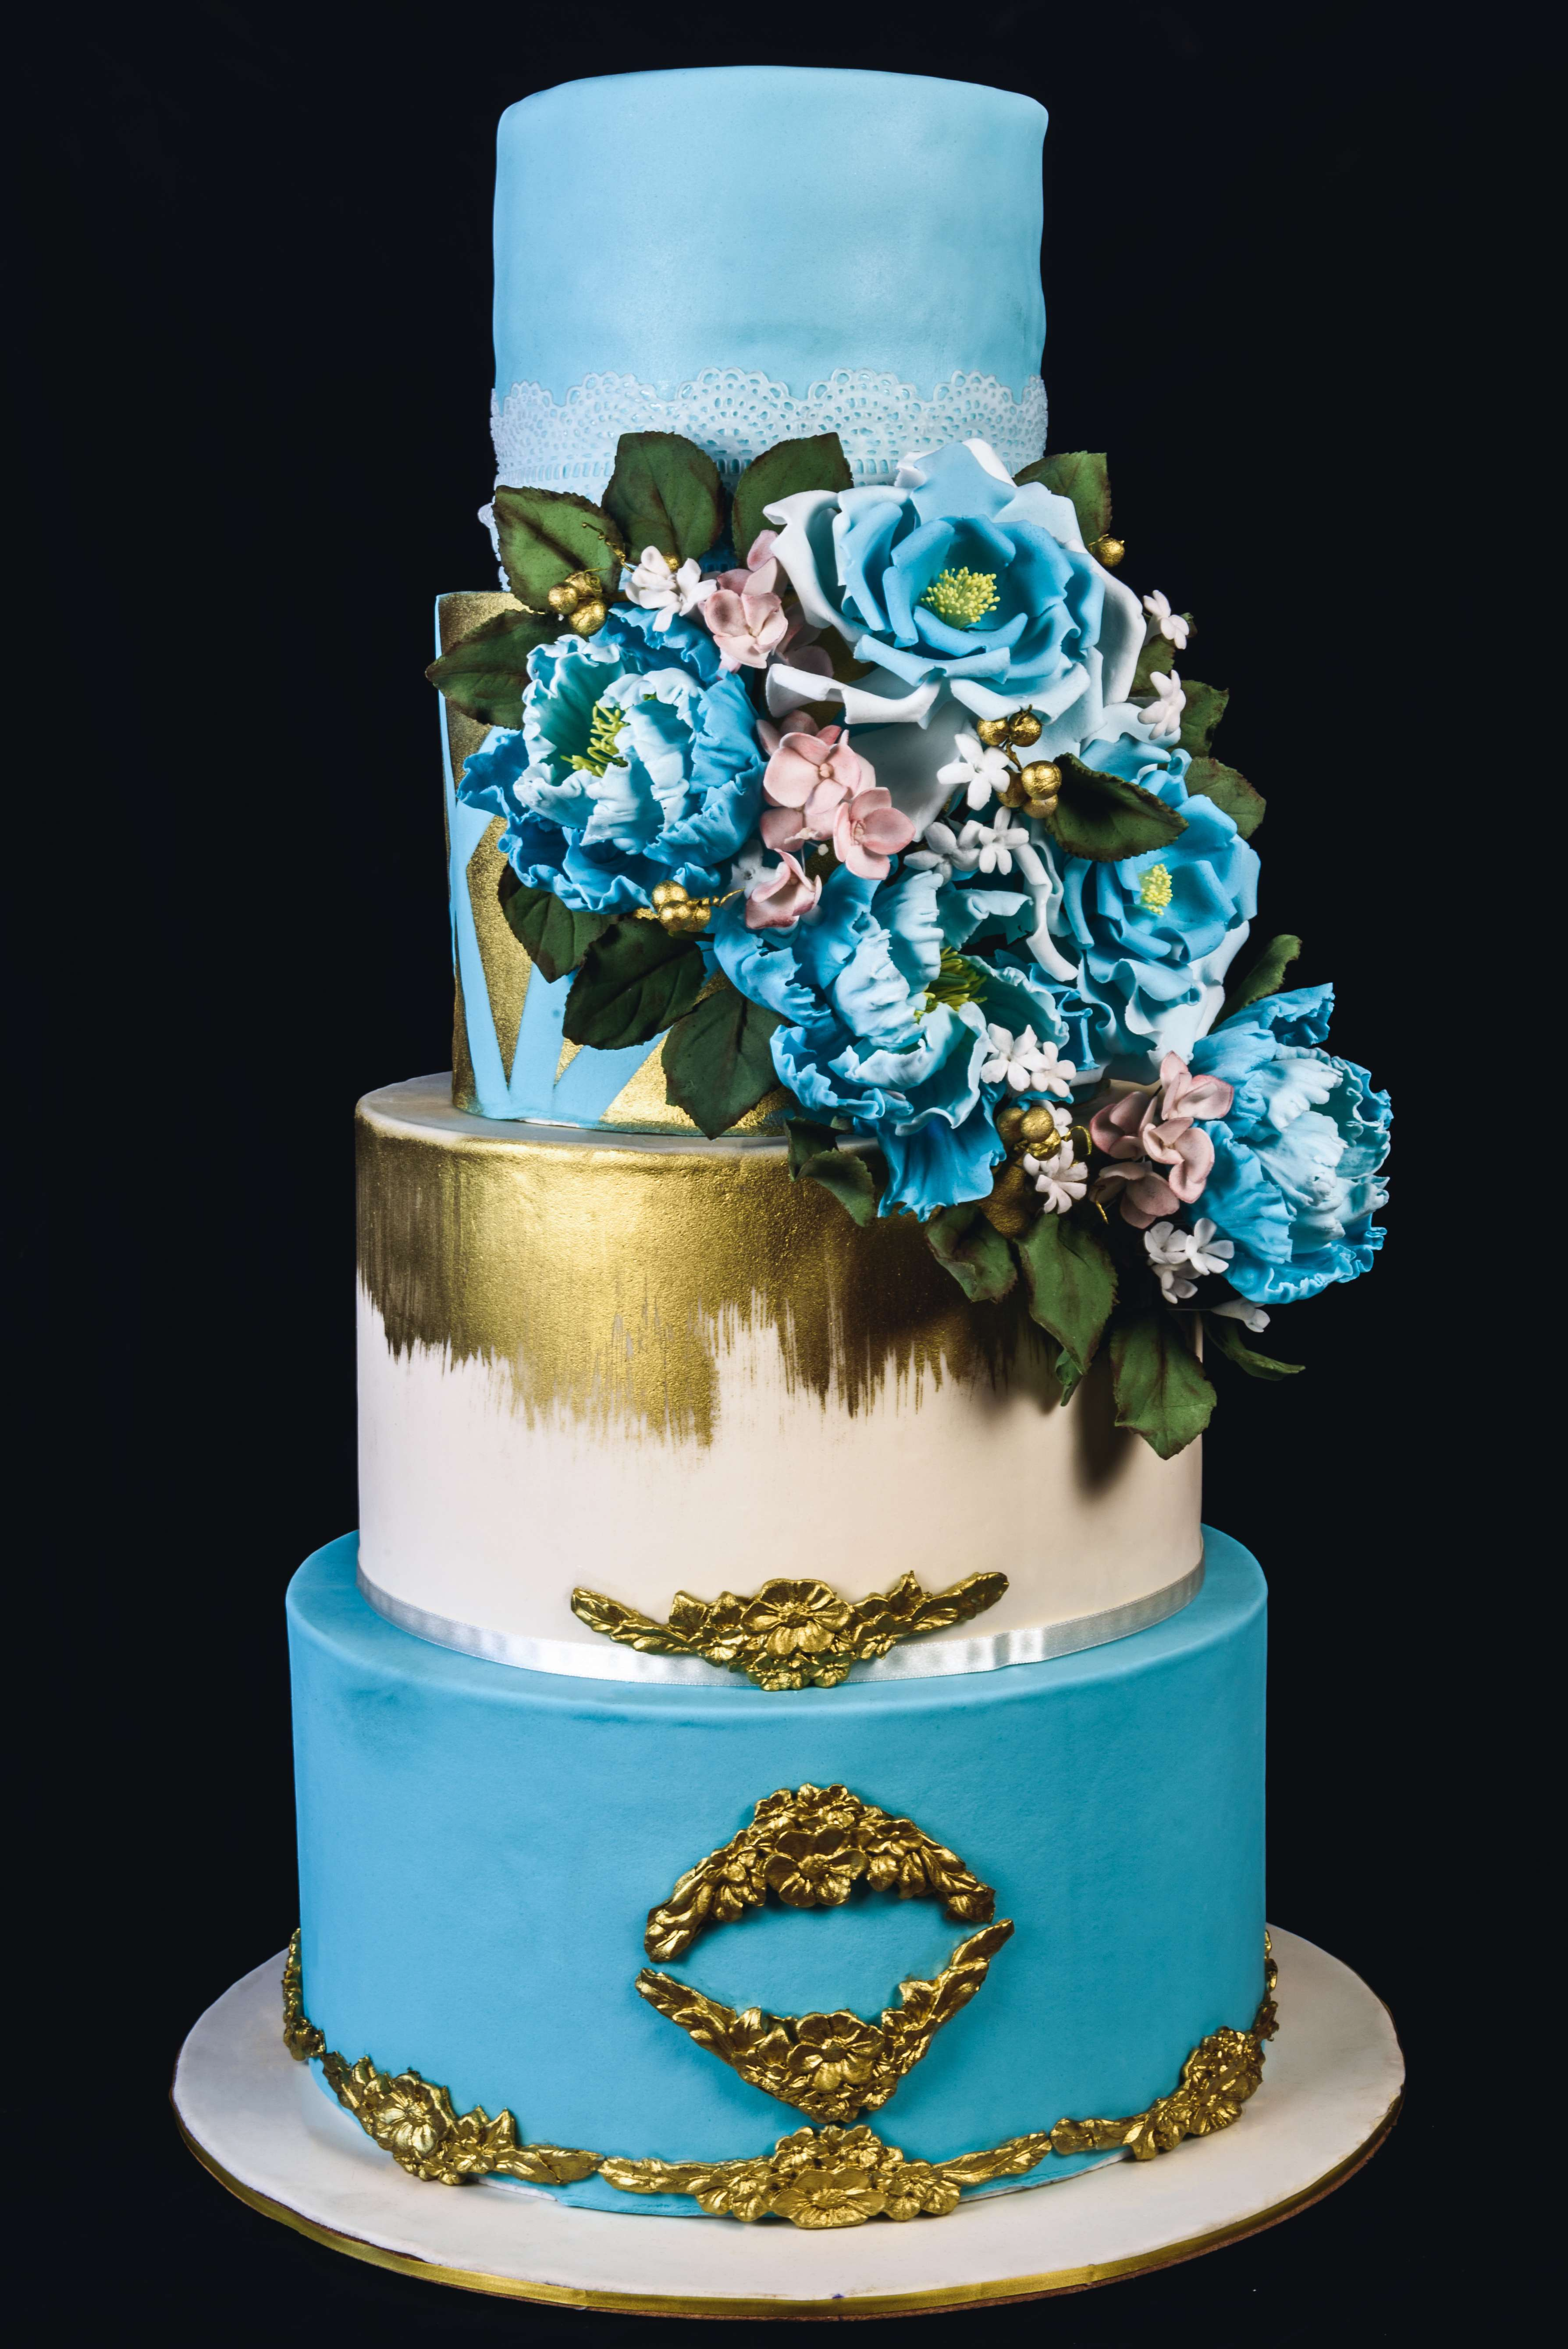 The Cake Company - Portfolio